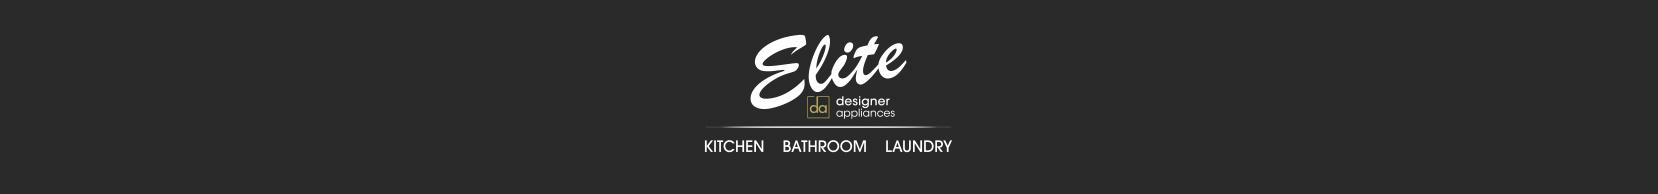 Elite Appliances